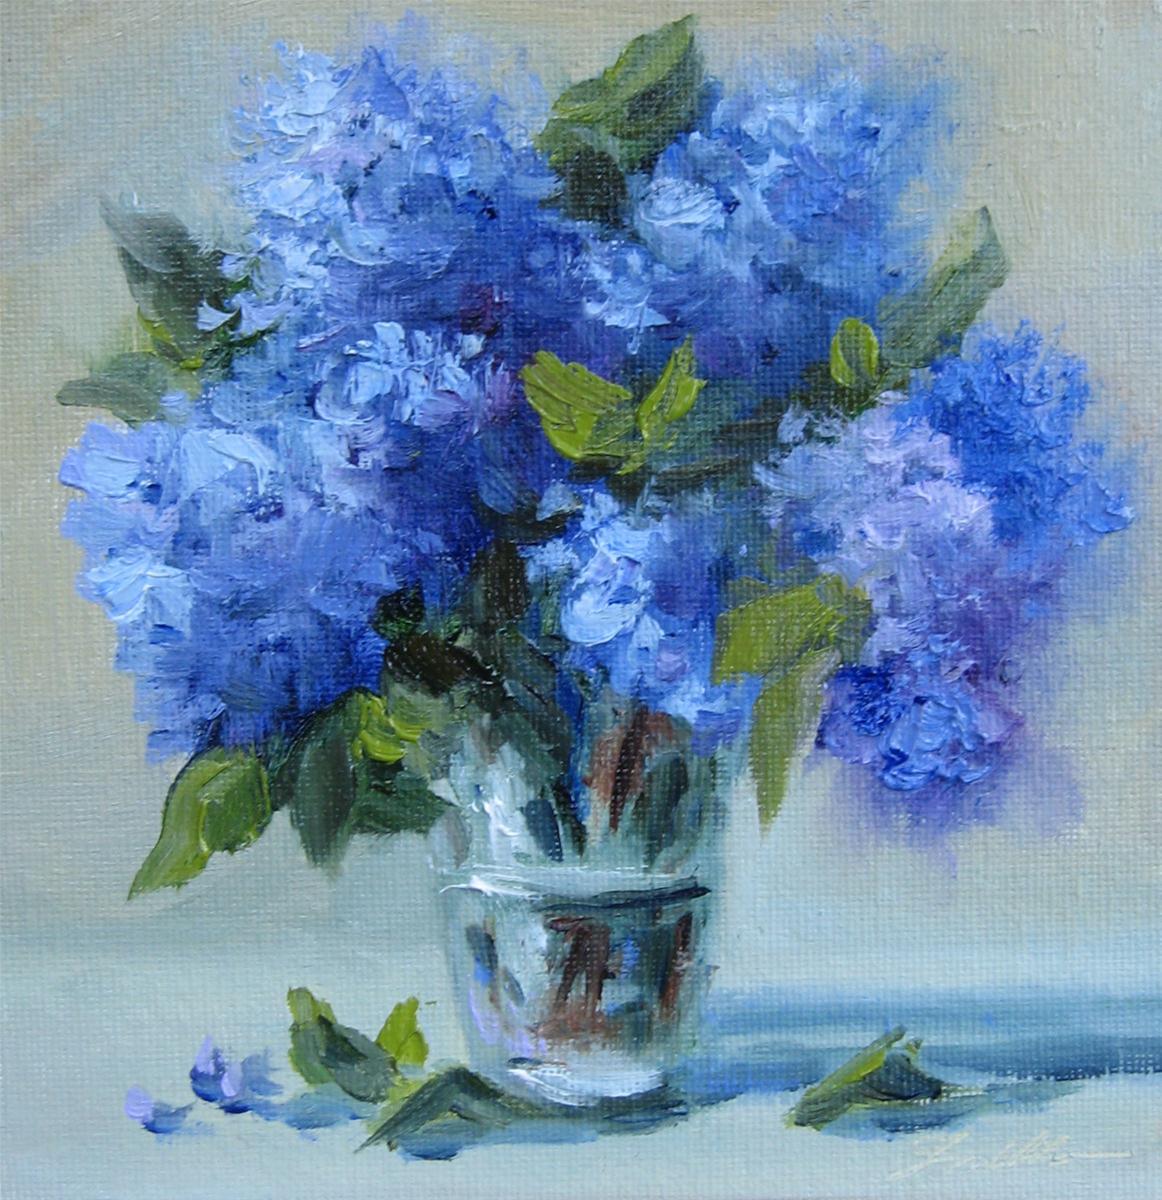 """Flower Study #26 Blue Hydrangeas in a glass vase"" original fine art by Pat Fiorello"